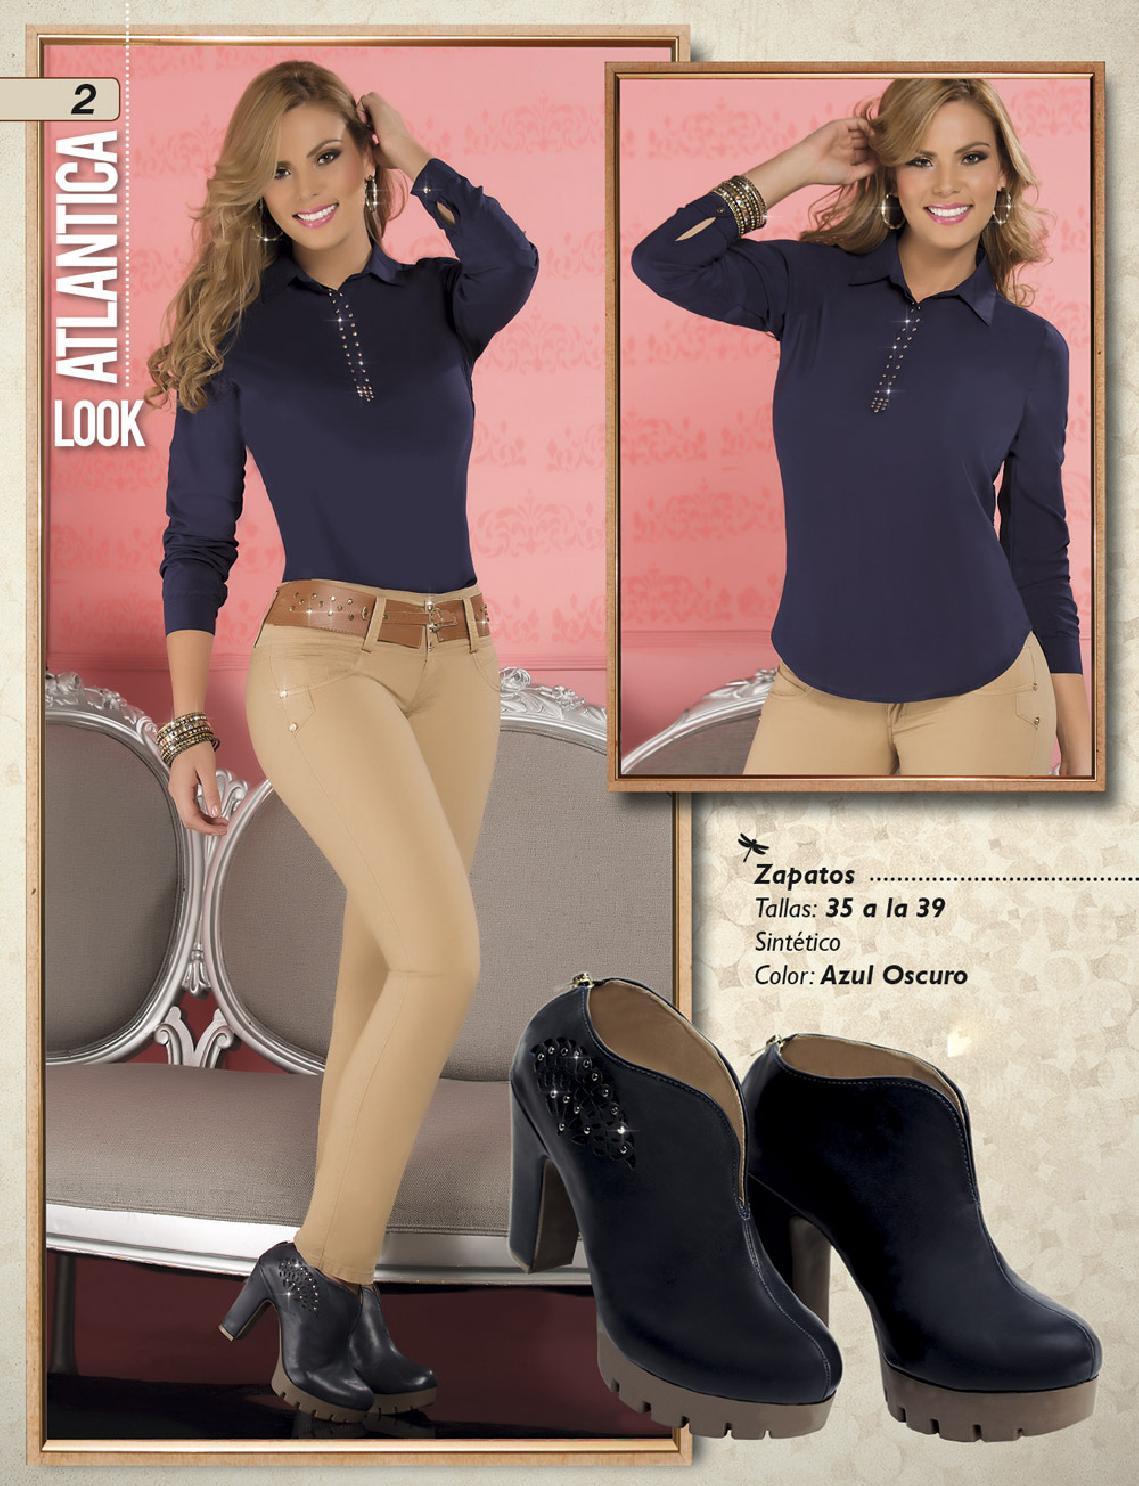 HAR Catálogo Jeans Levantacola by newkjeans - Issuu